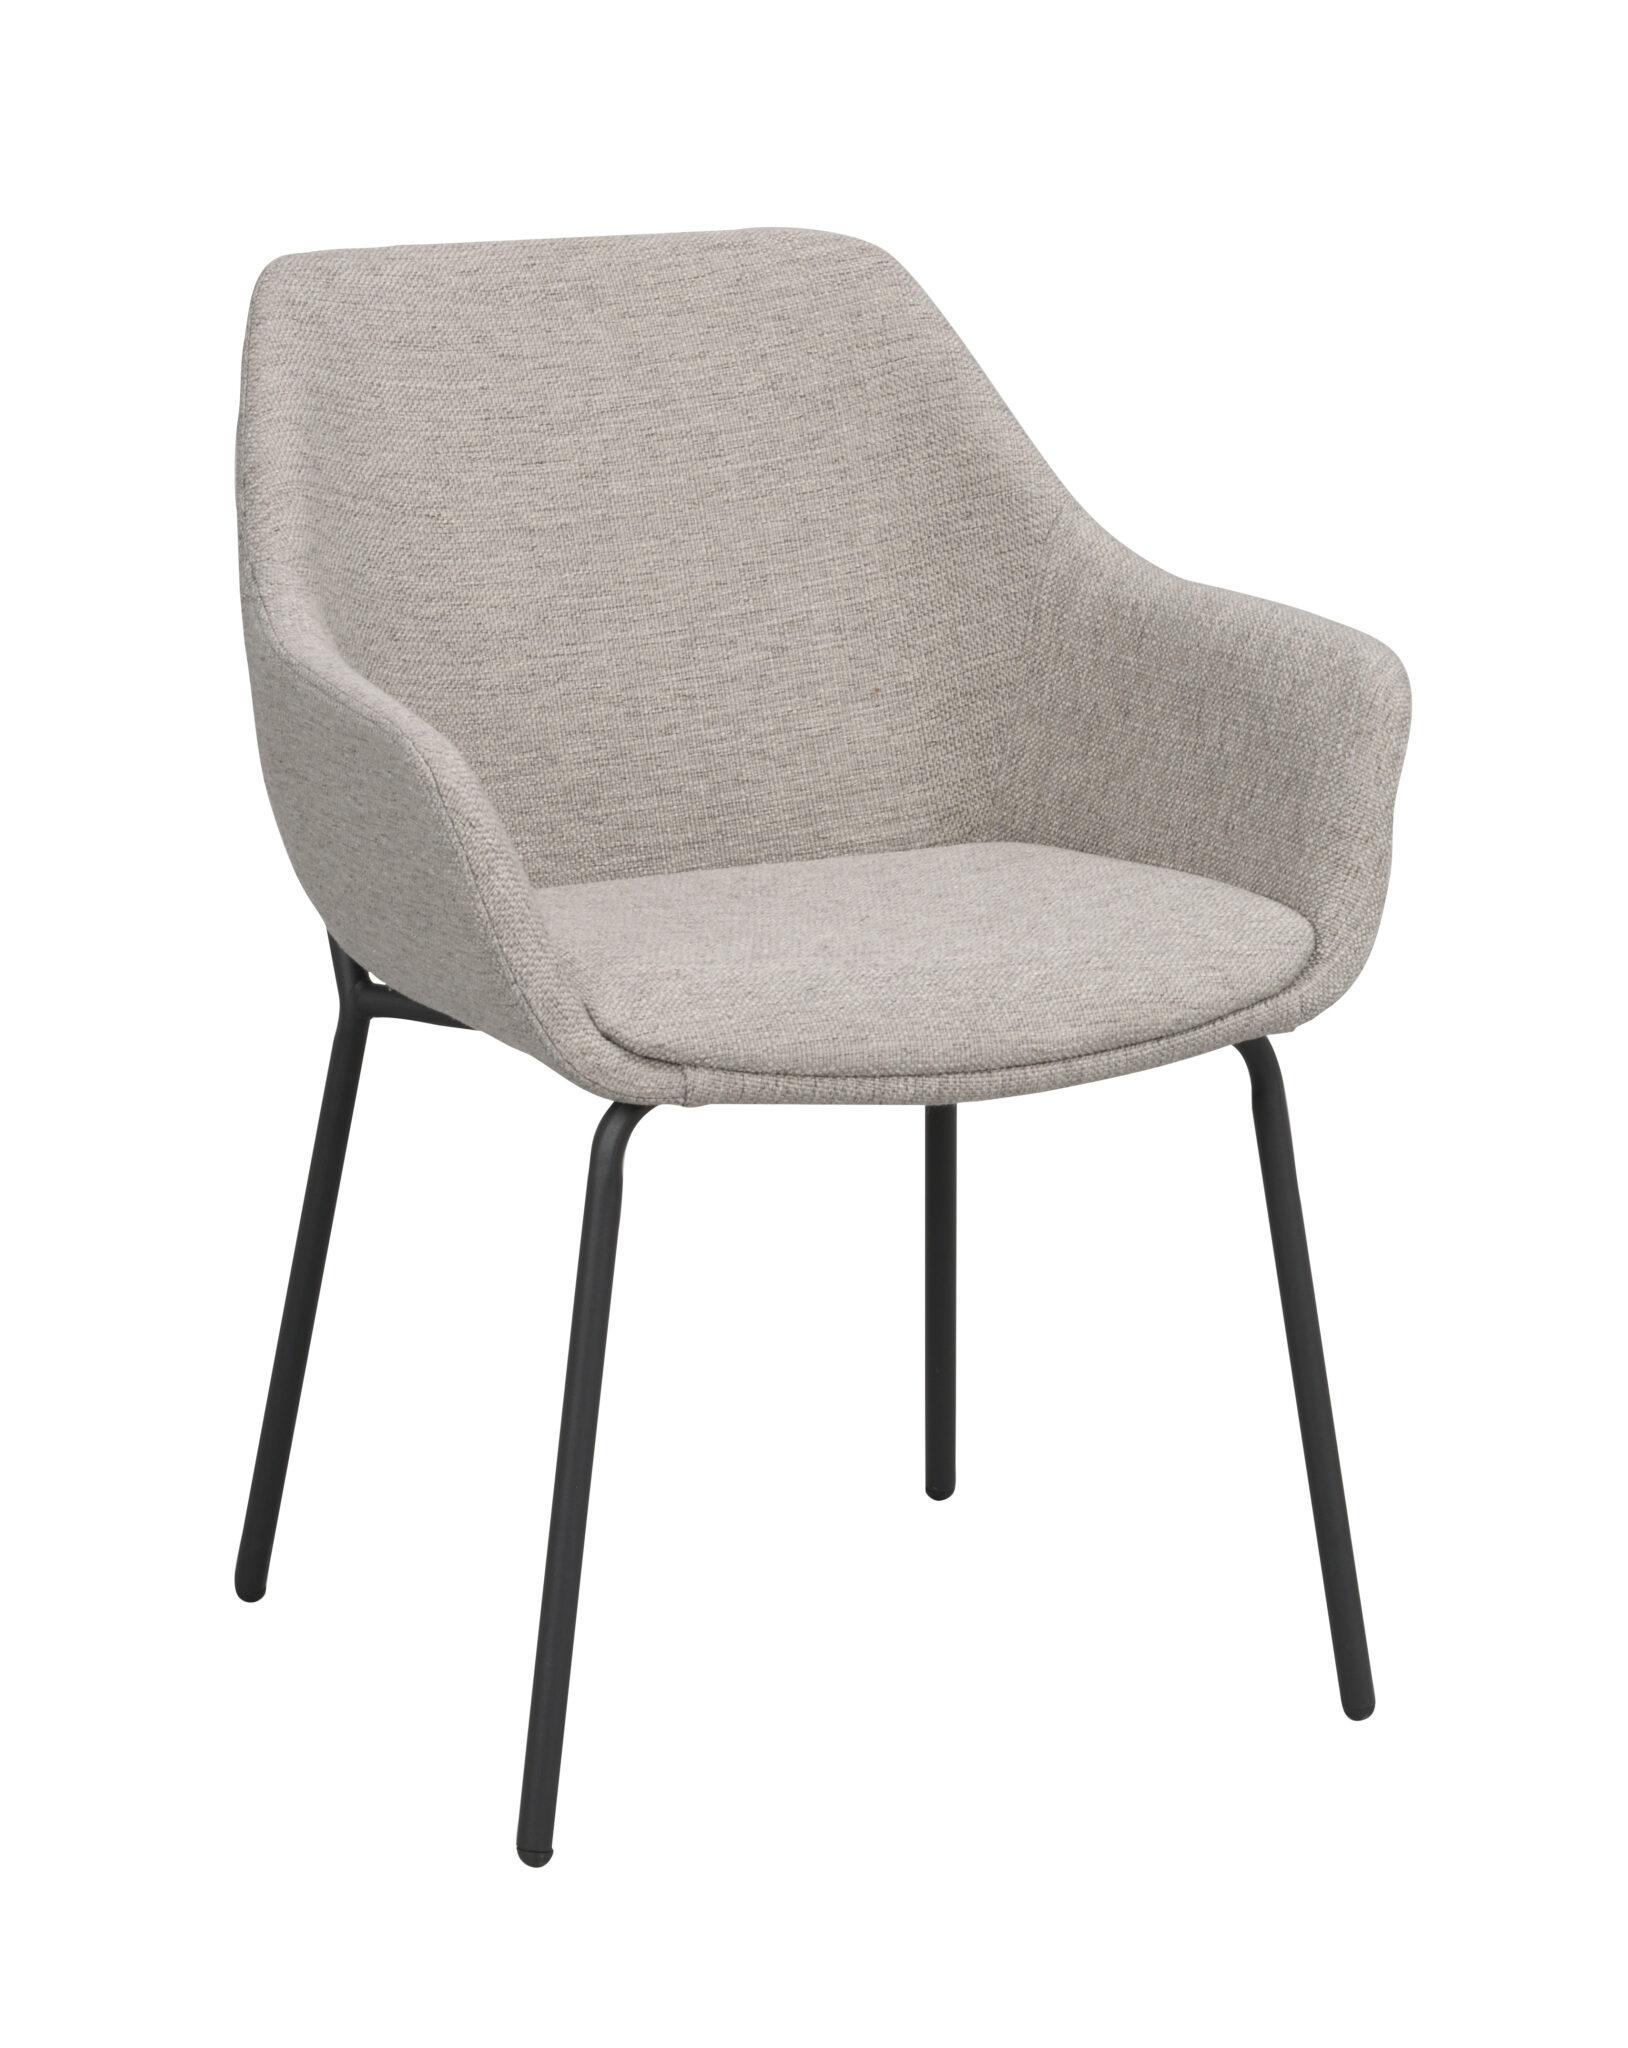 Haley arm chair Light grey_black 110480 1